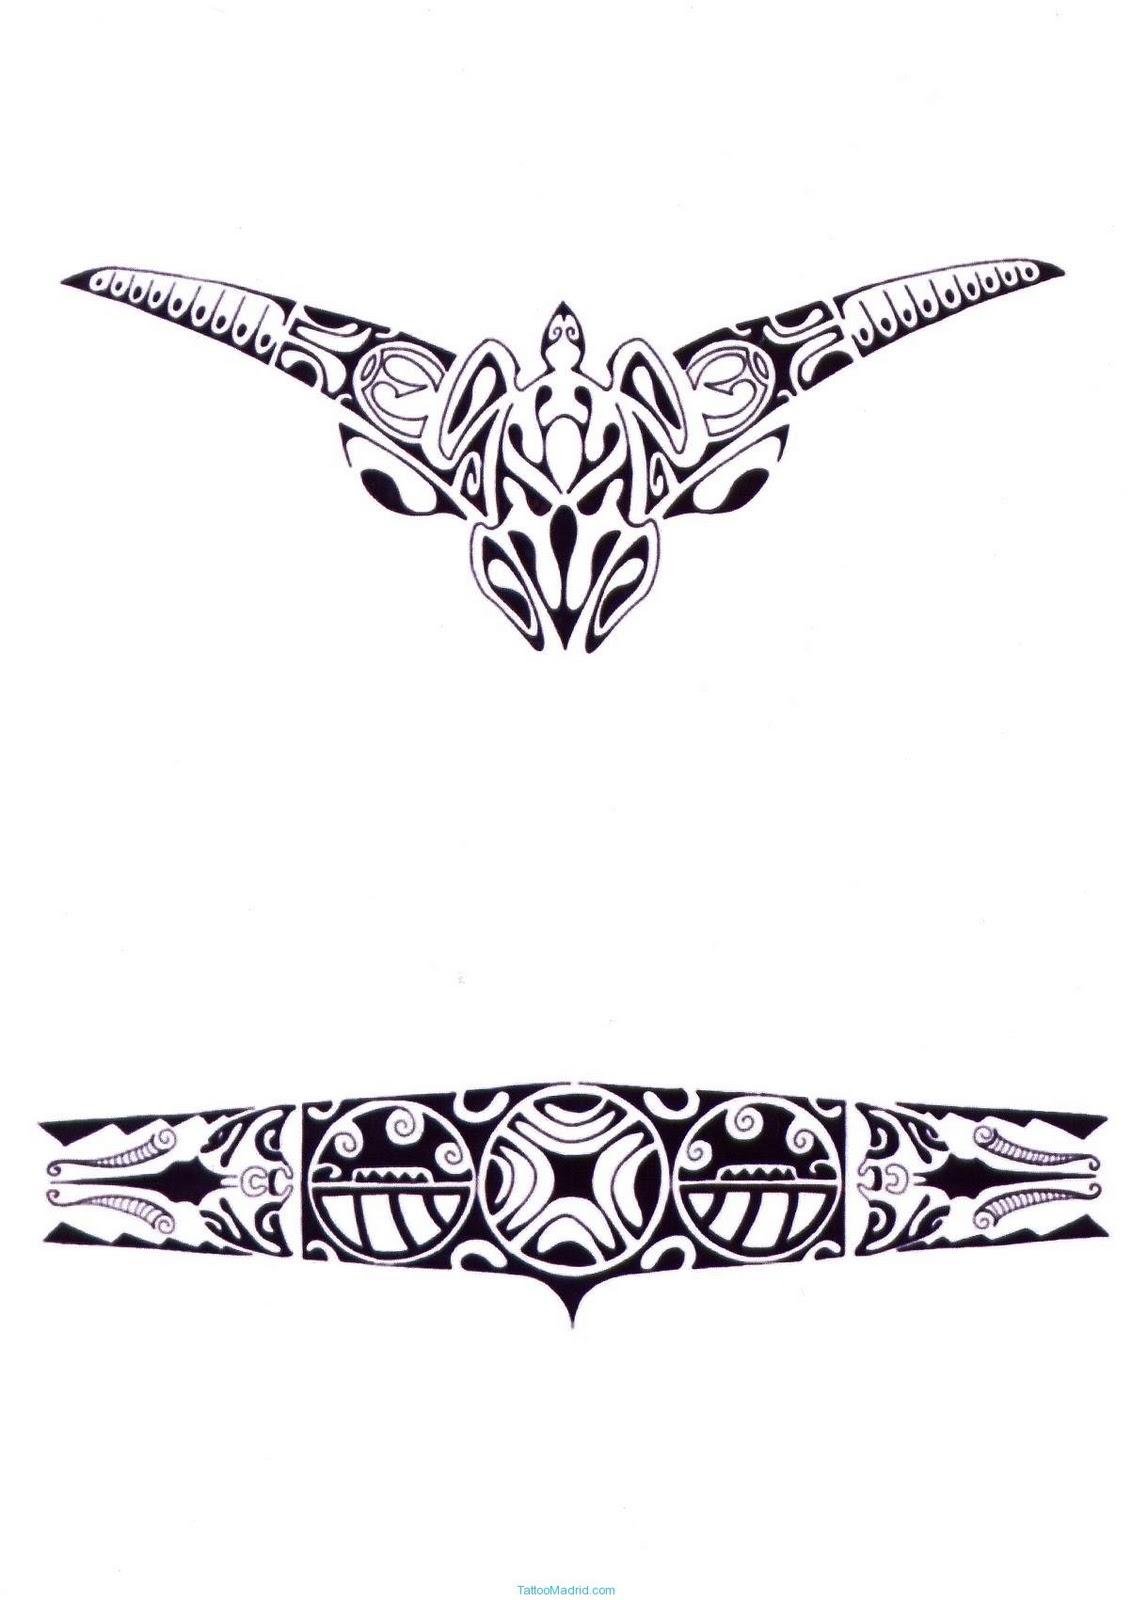 Plantillas De Tatuajes Maories Google Image Result For Tatuajes